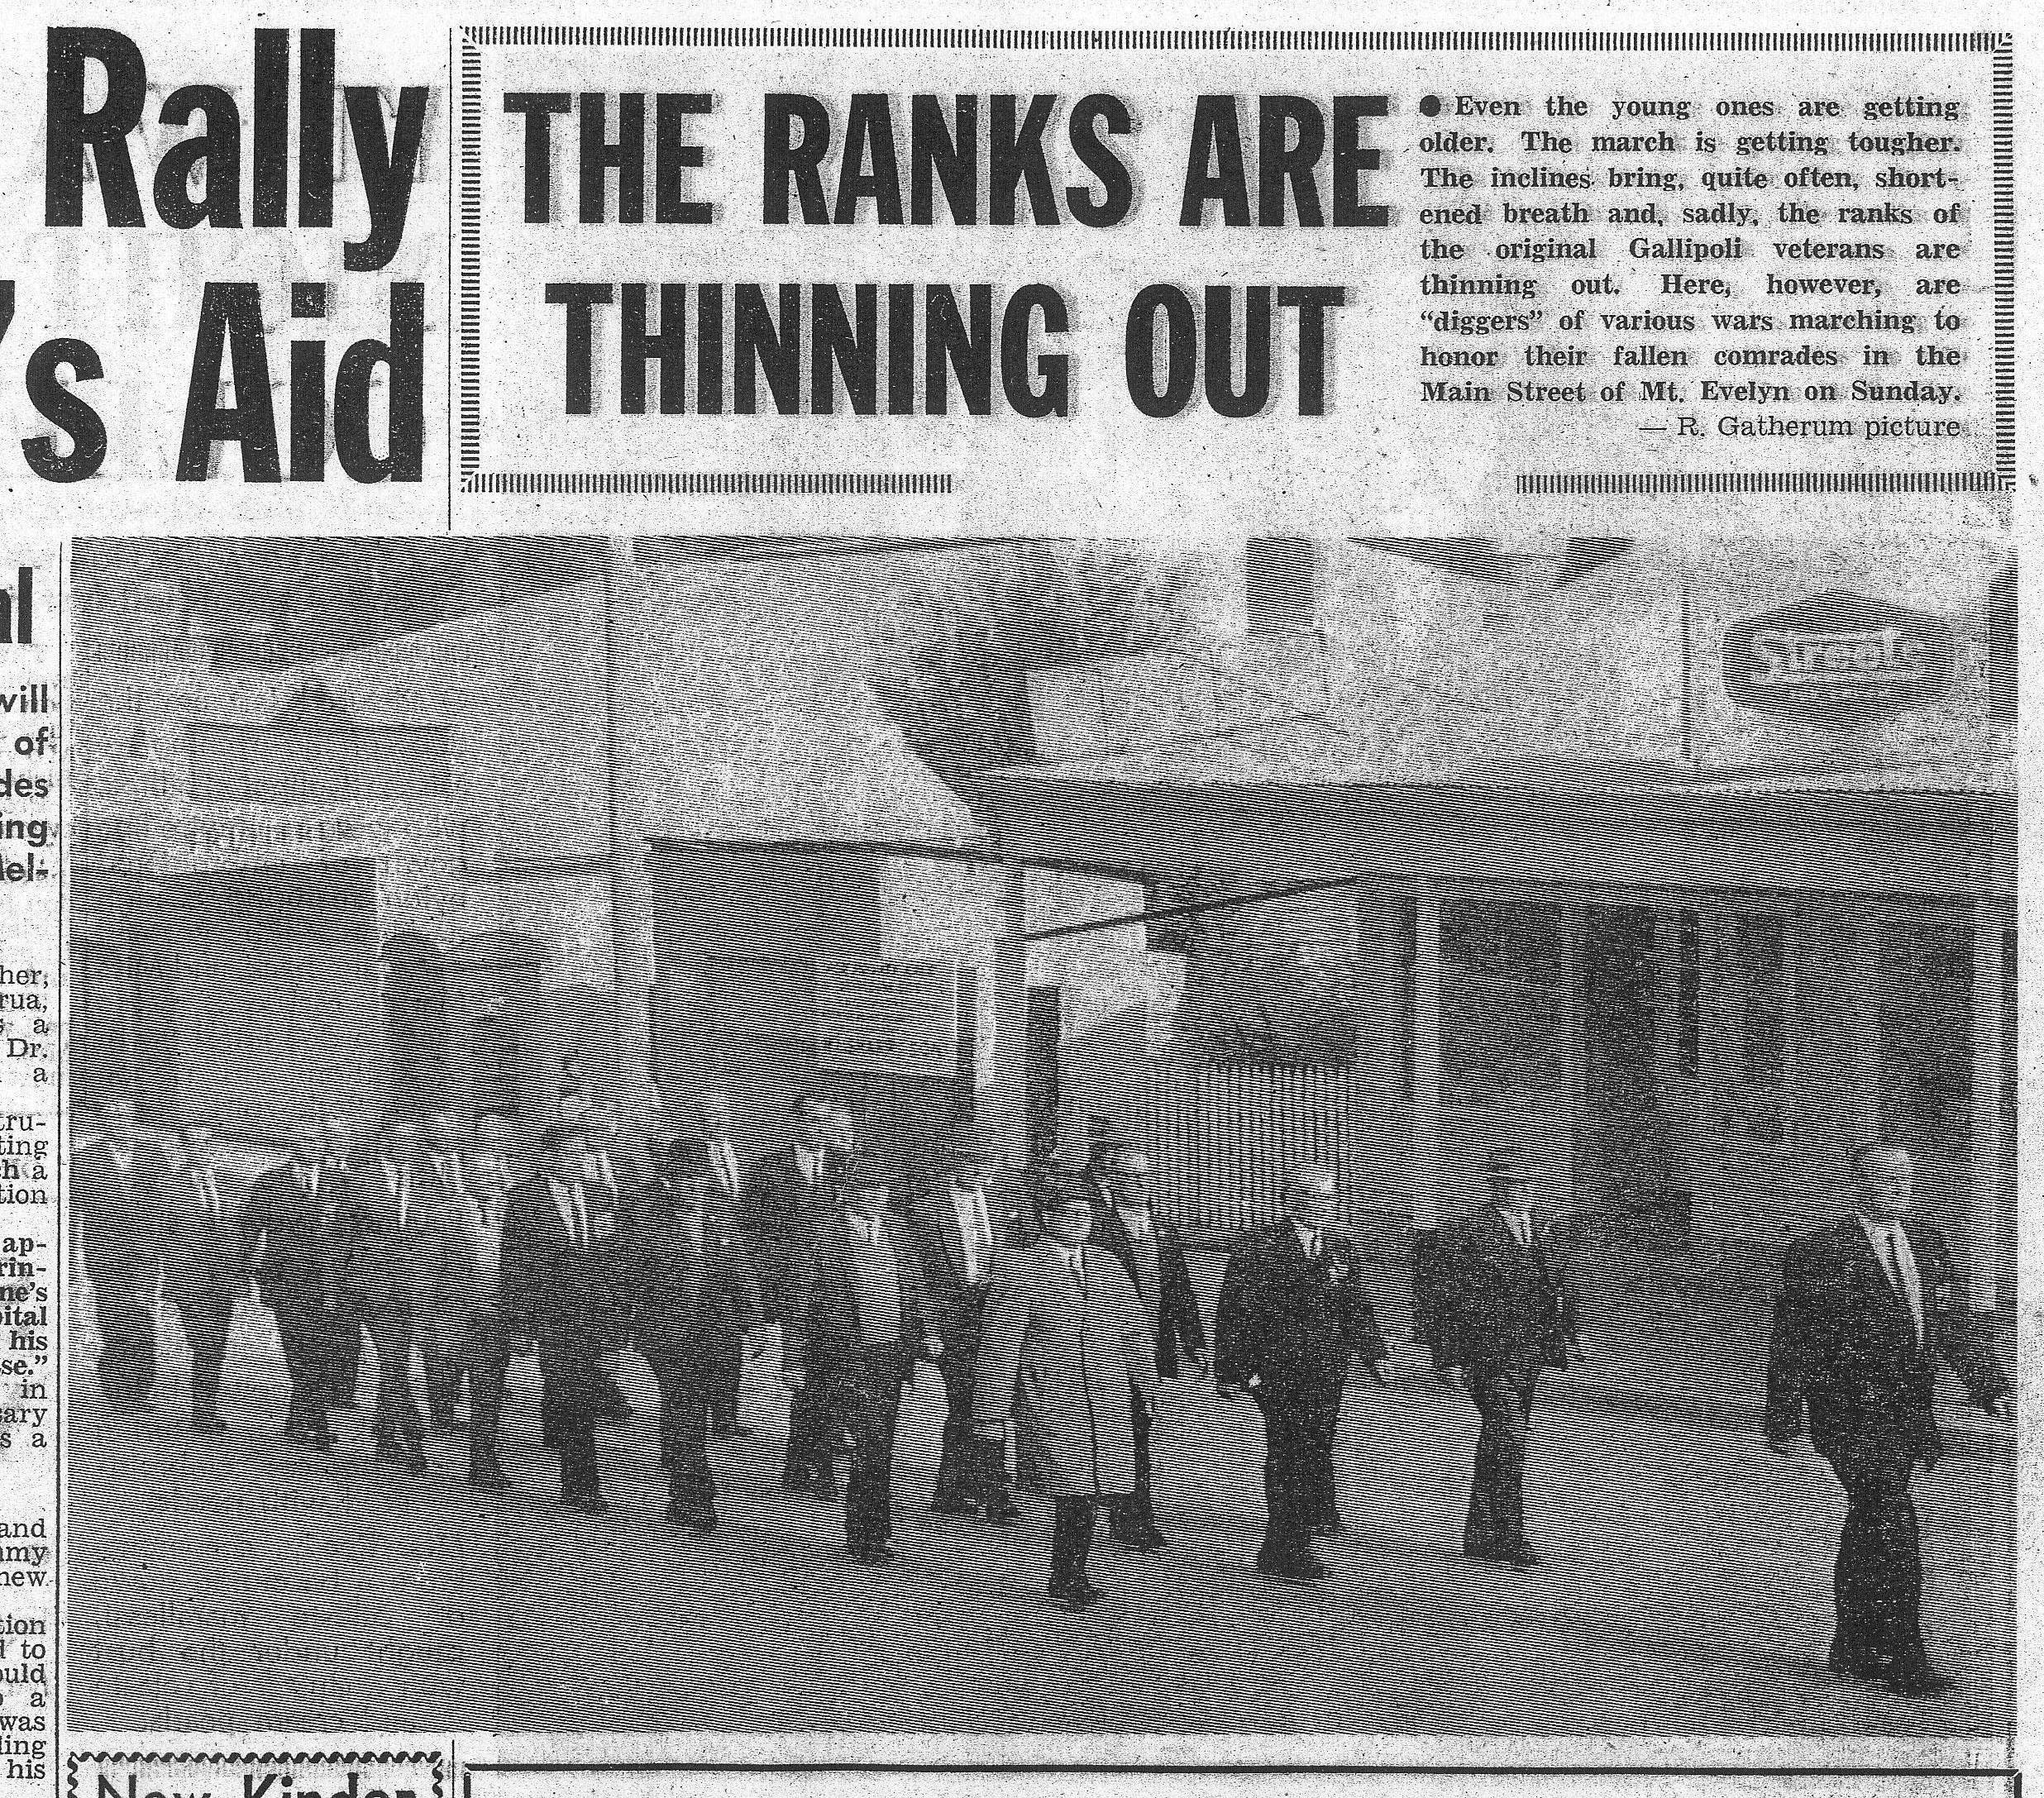 1967 april 27th